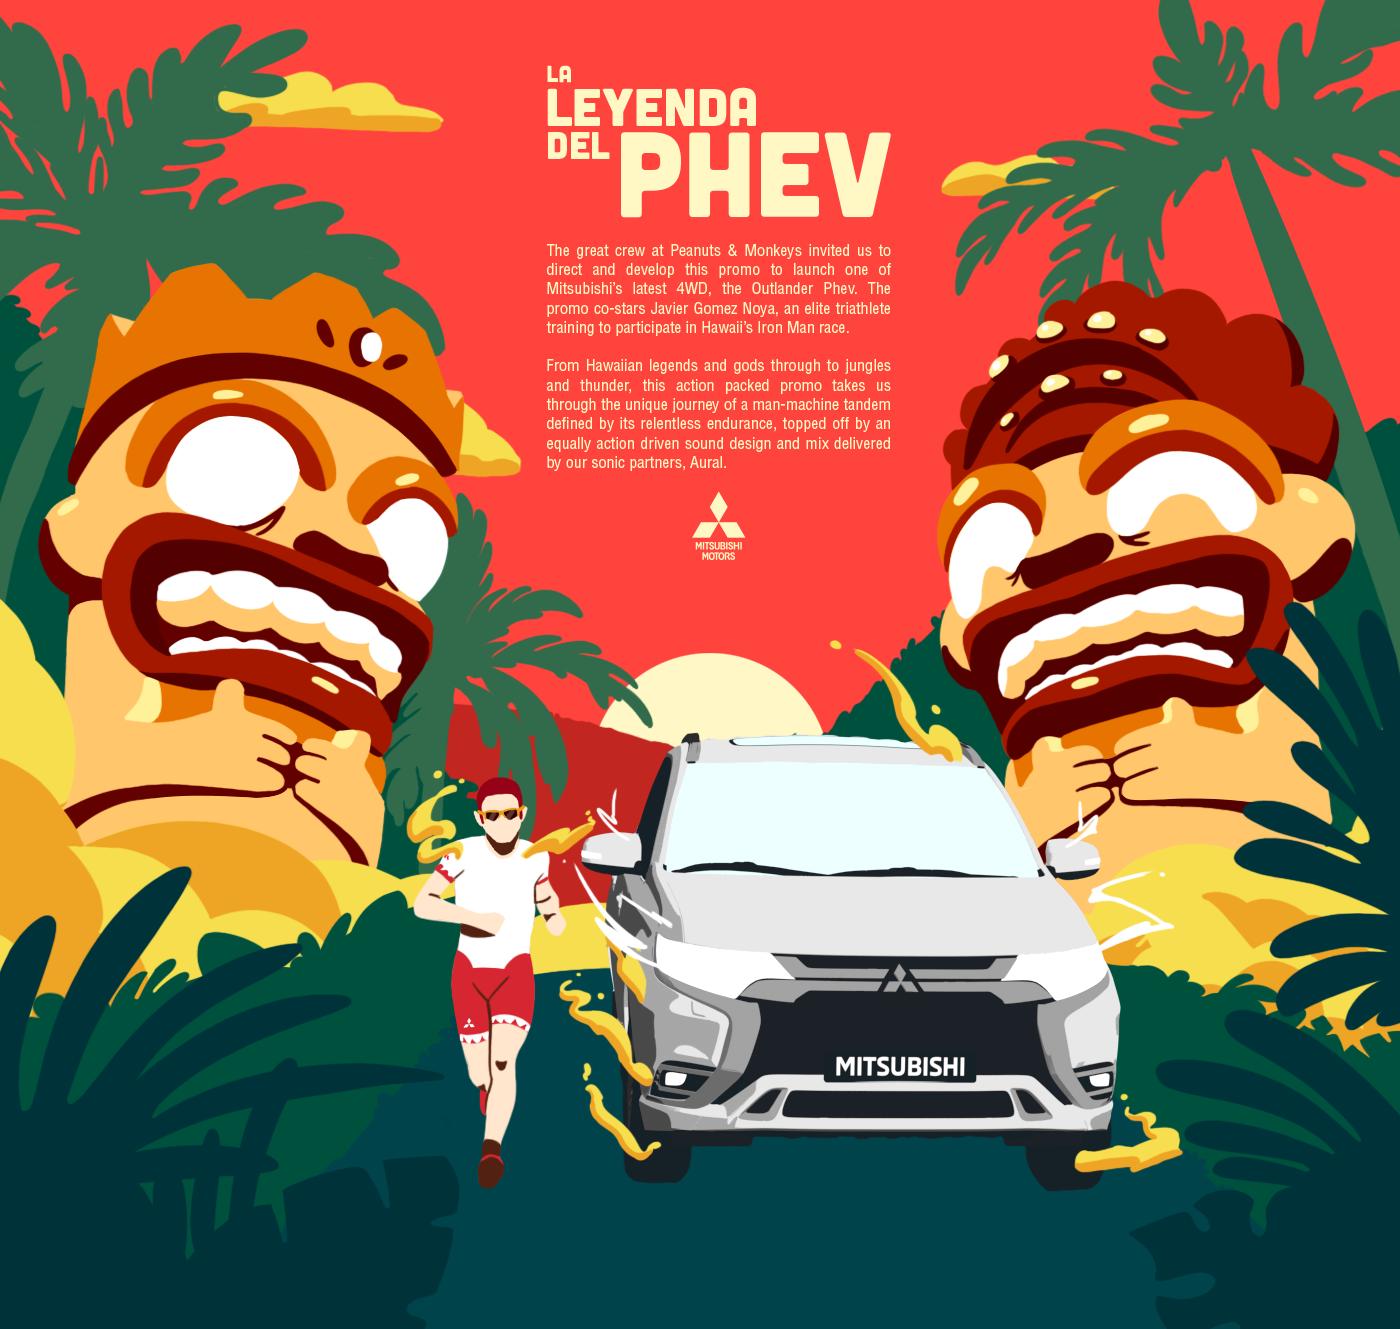 HAWAII,gods,2D,ironman,athlete,jungle,action,sports,explosions,car